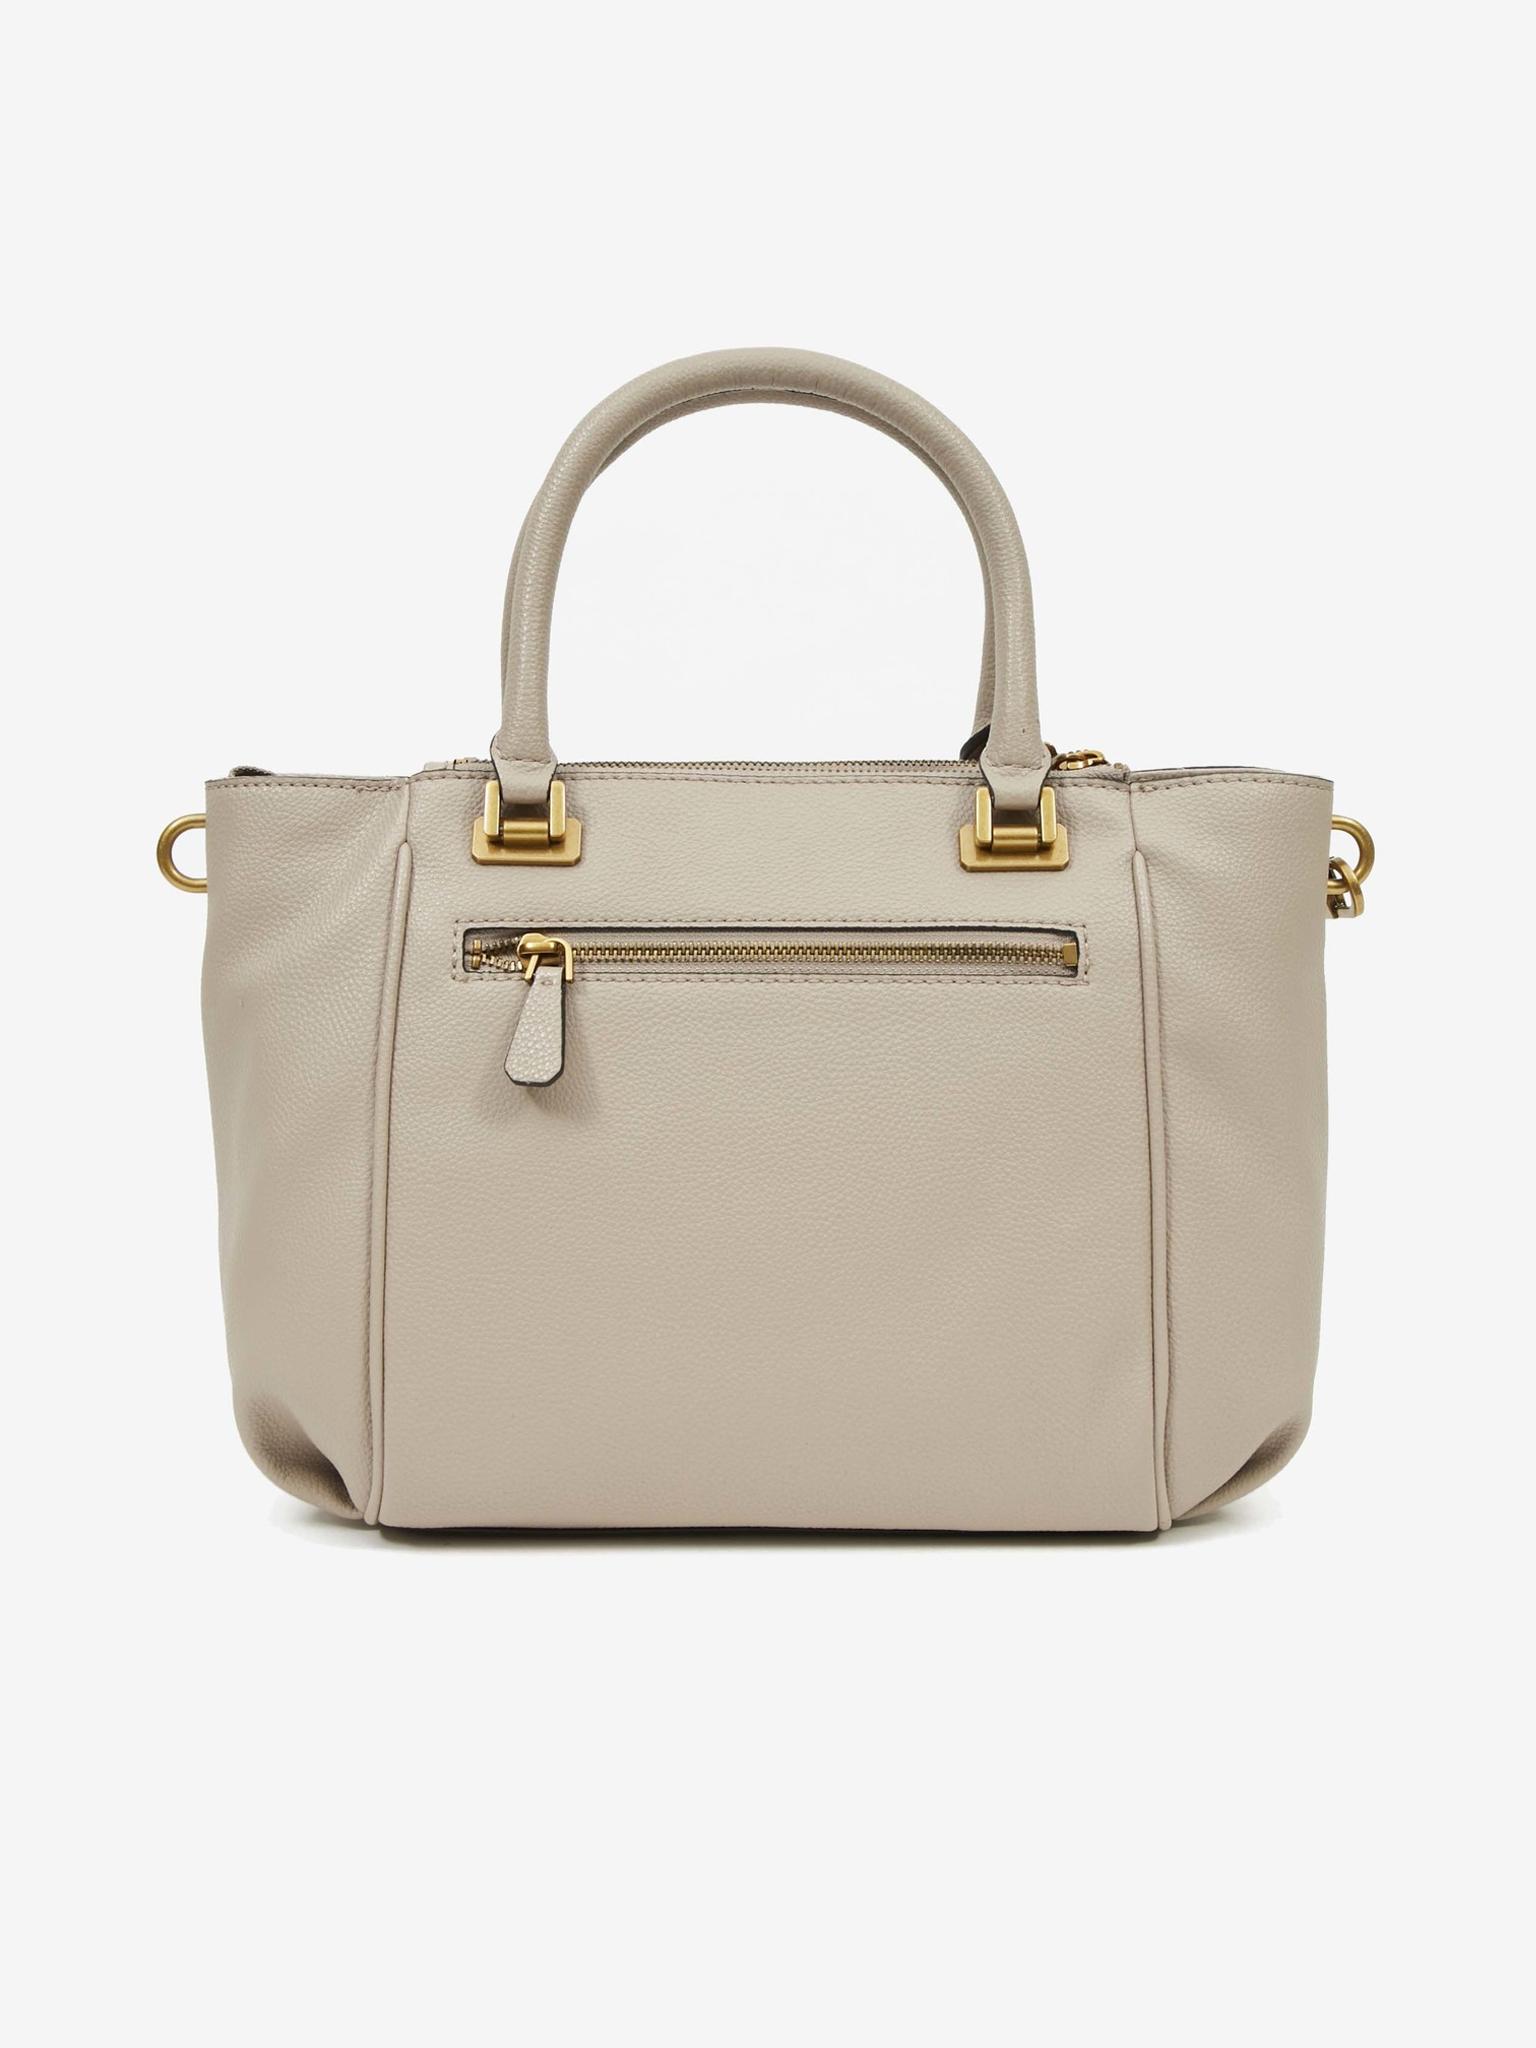 Guess brown handbag Destiny Status